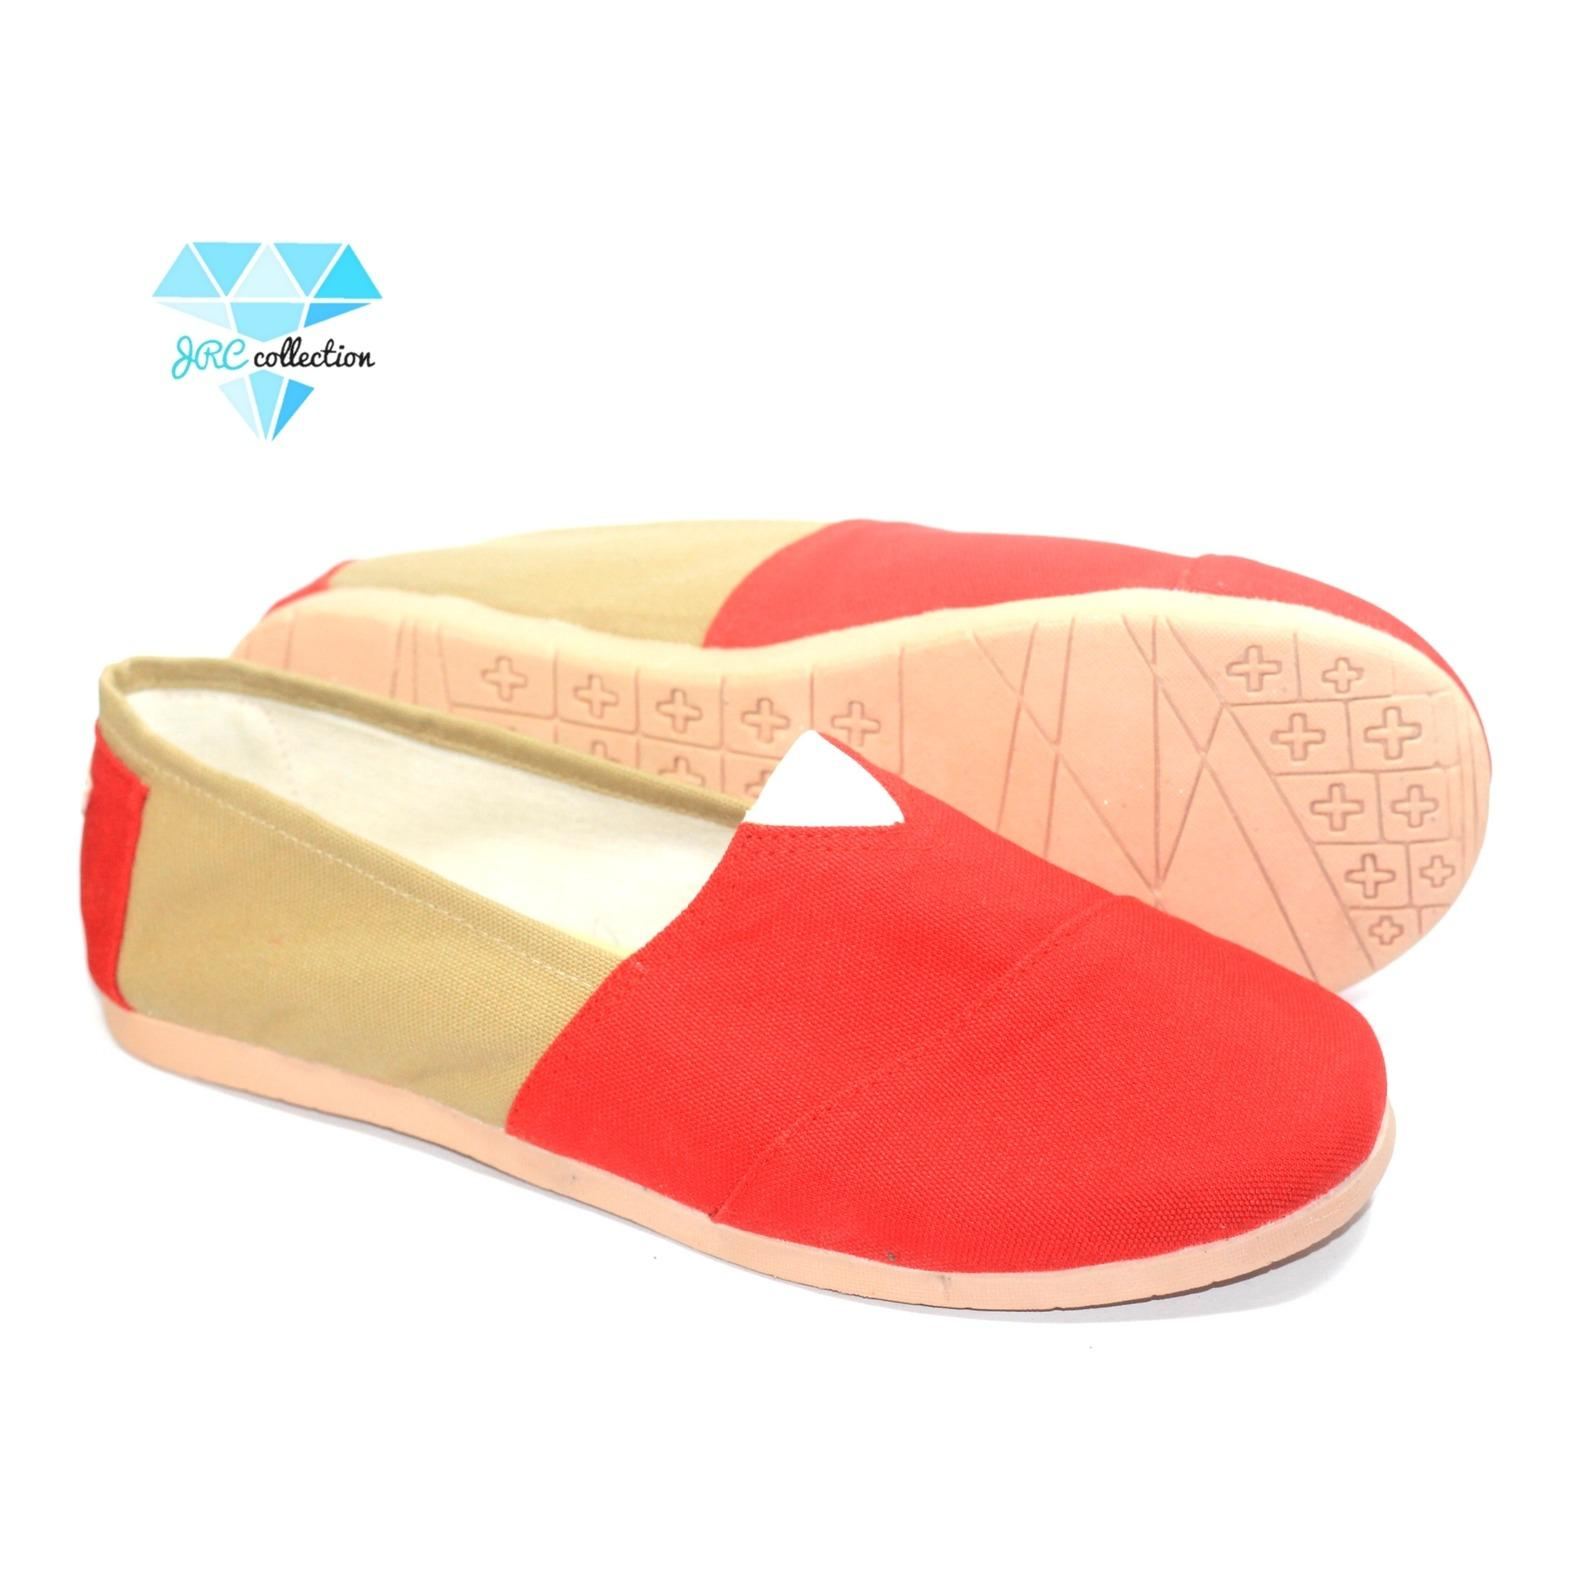 Beli Jrc Sepatu Flatshoes Slip On 2 Warna Sejenis Toms Wakai Kredit Jawa Barat